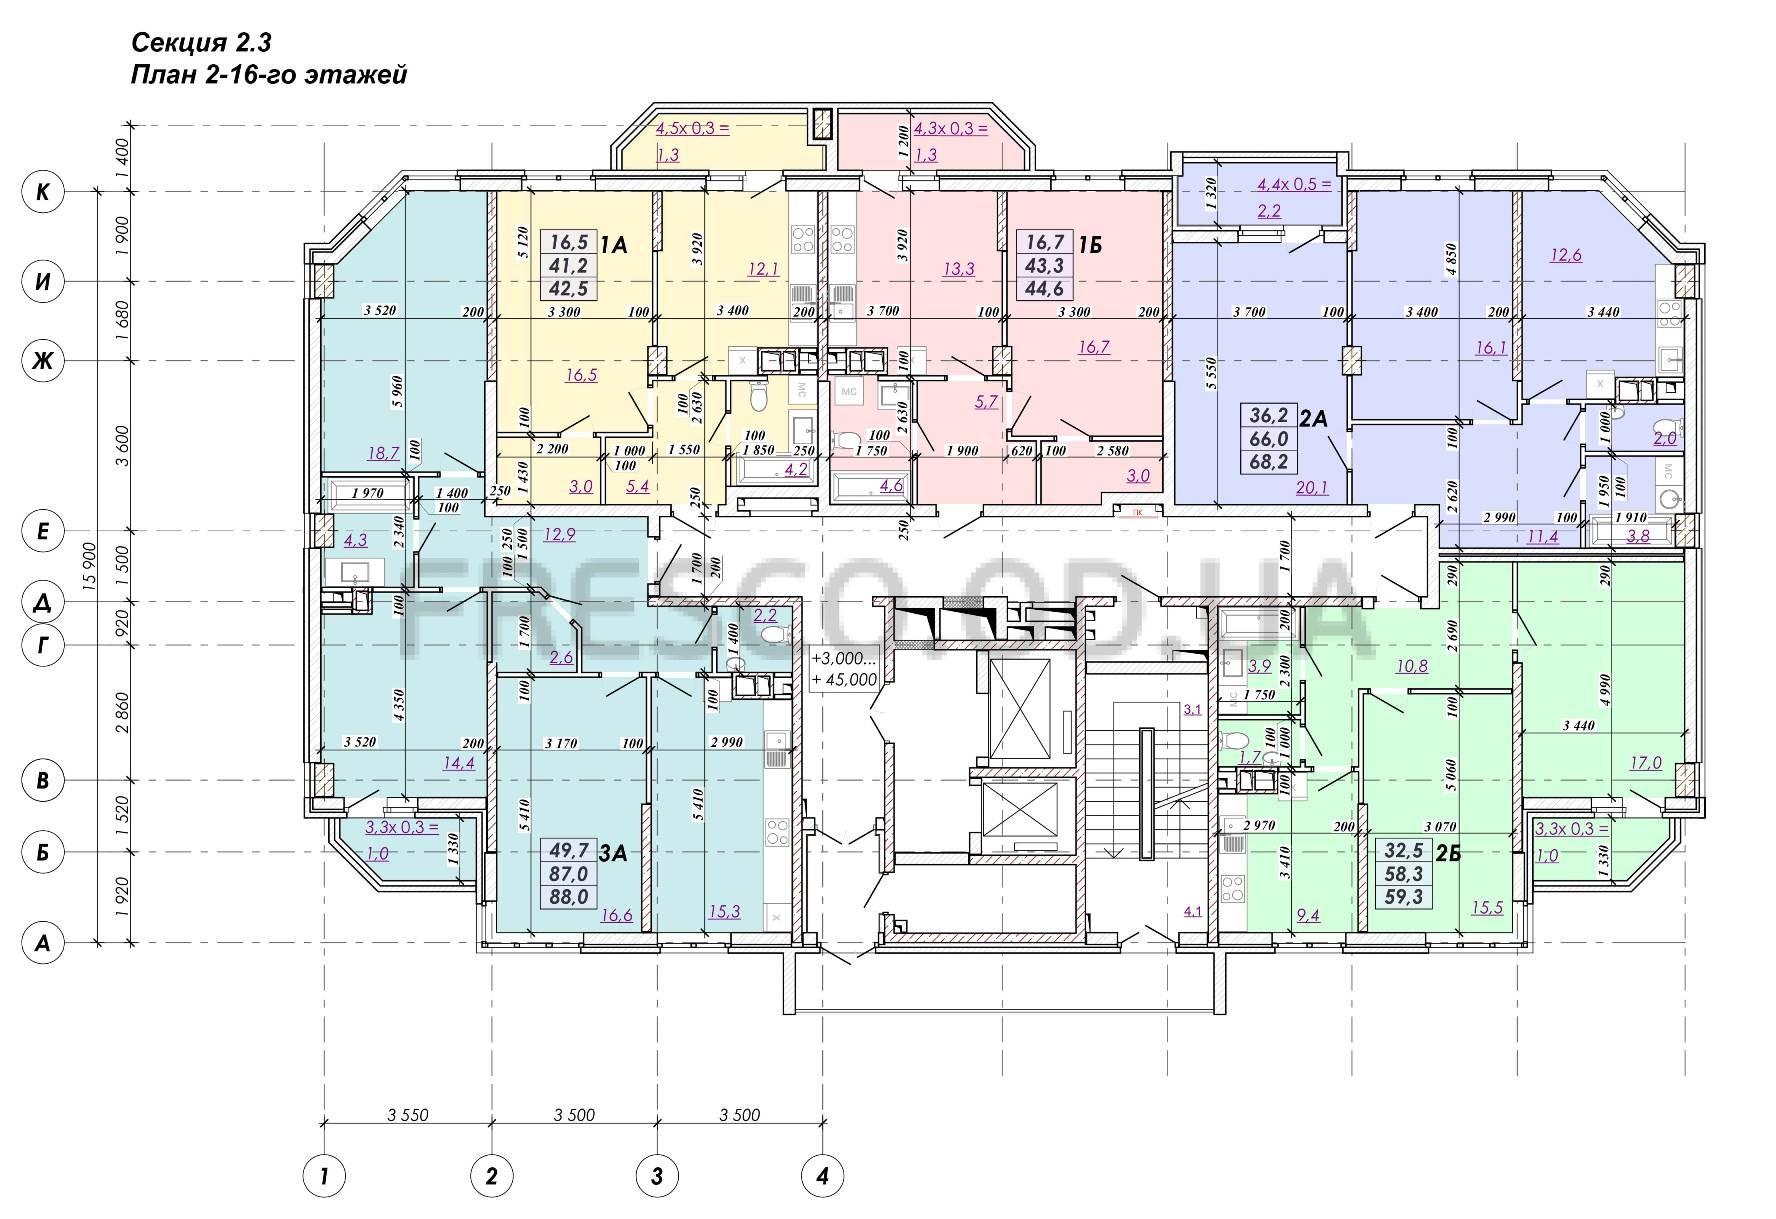 ЖК RealPark (Реал Парк) секция 2.3 план 2-16 этажа